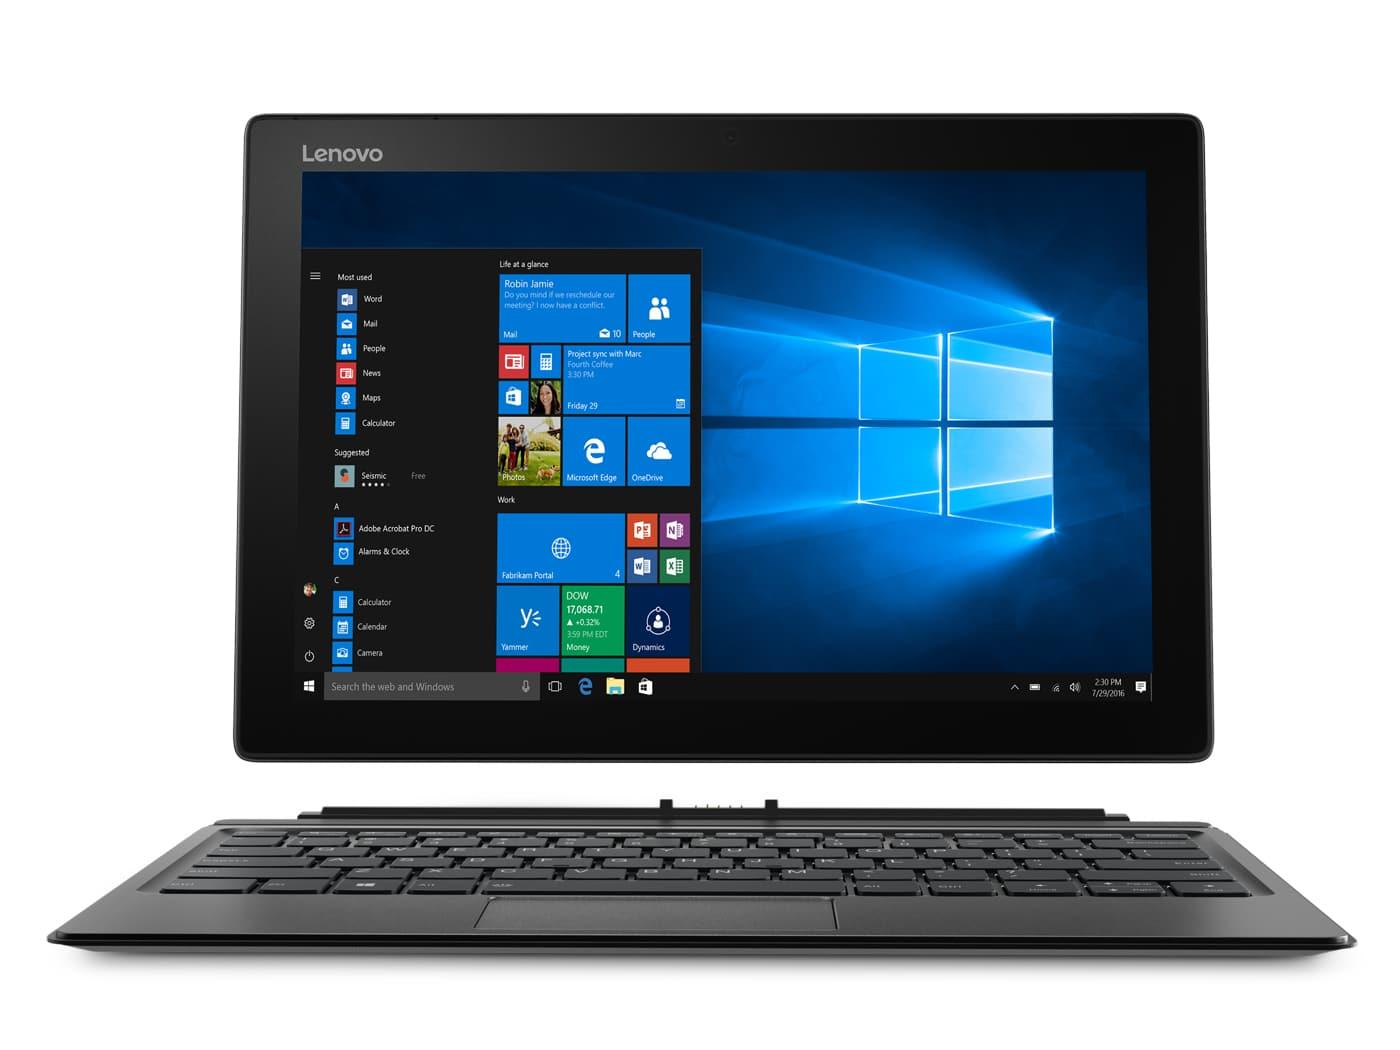 Lenovo Miix 520-12IKB, Tablette 12 pouces + dock 4G Quad i5 SSD256 à 1200€